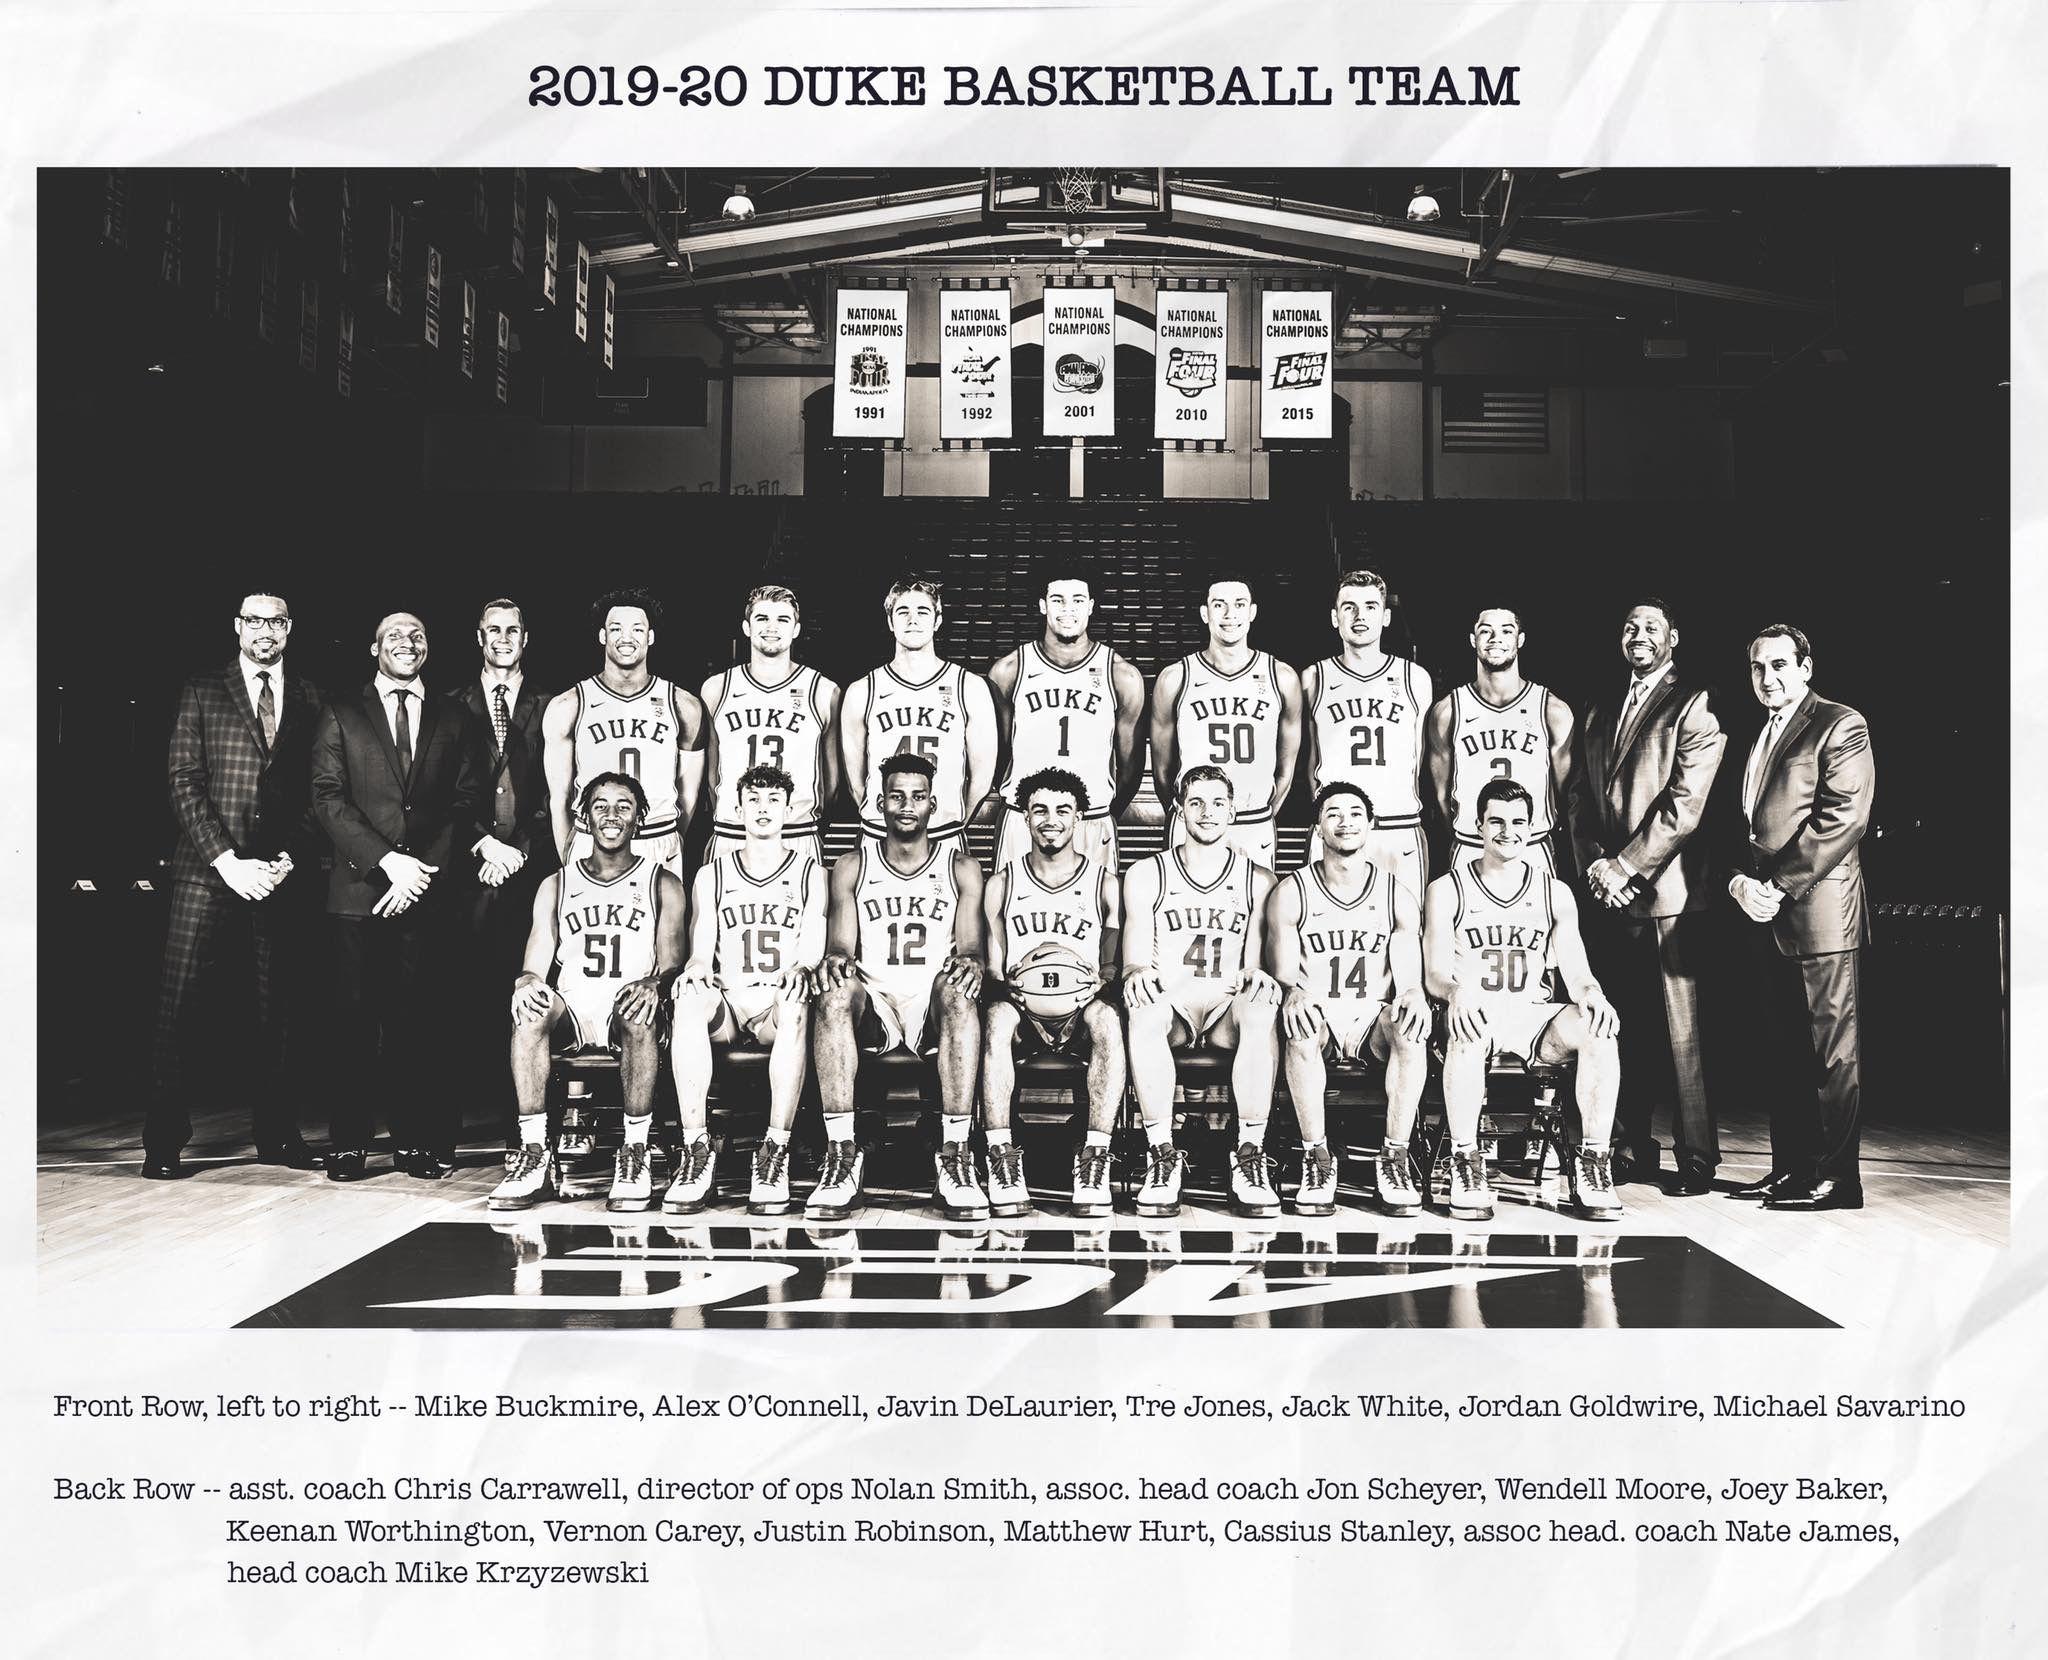 201920 Duke Basketball Duke basketball, Duke blue